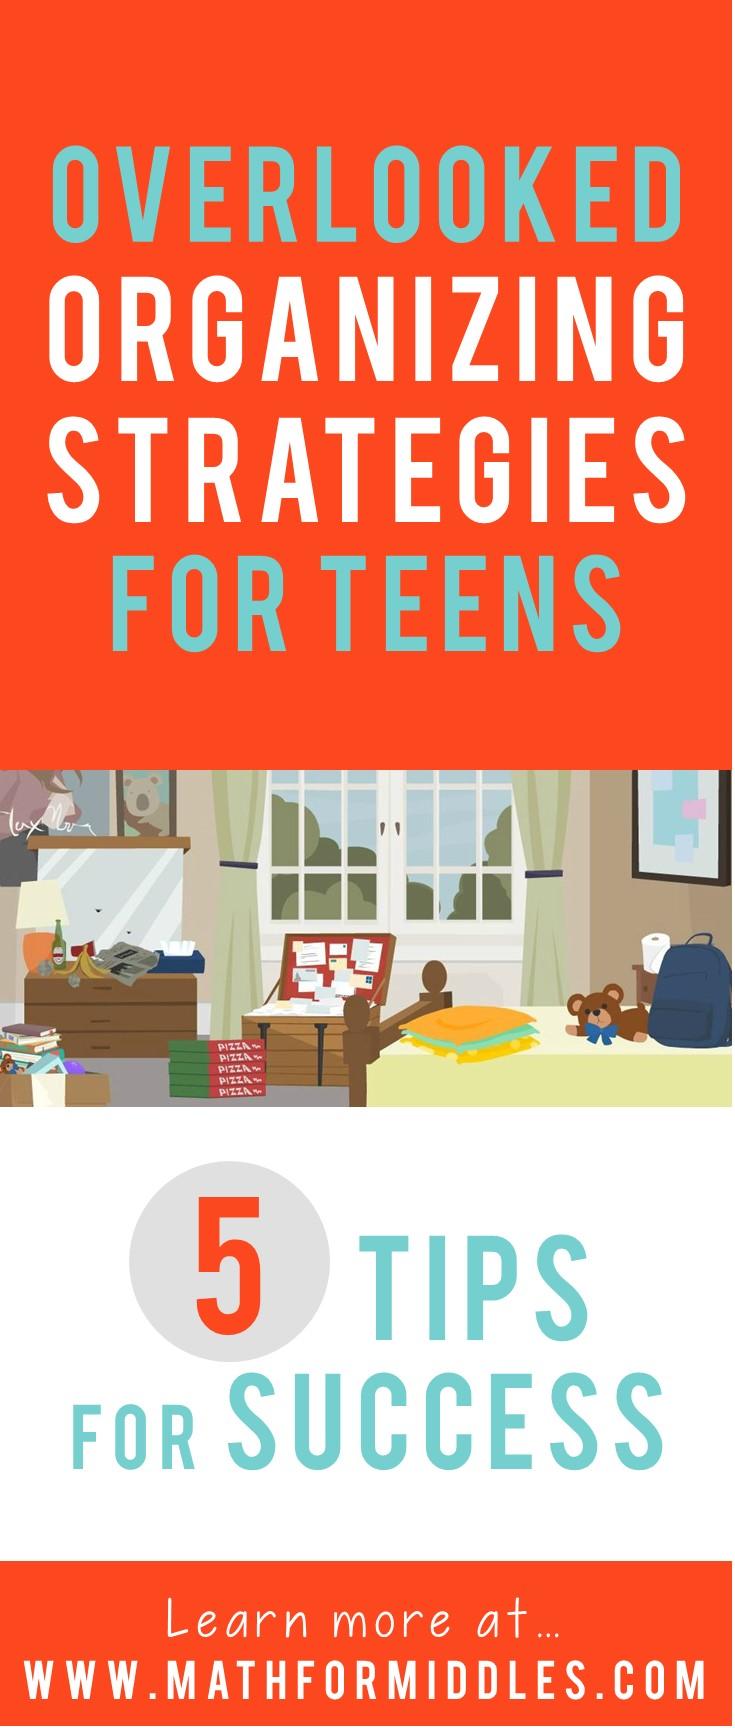 Overlooked Organization Strategies for Teens